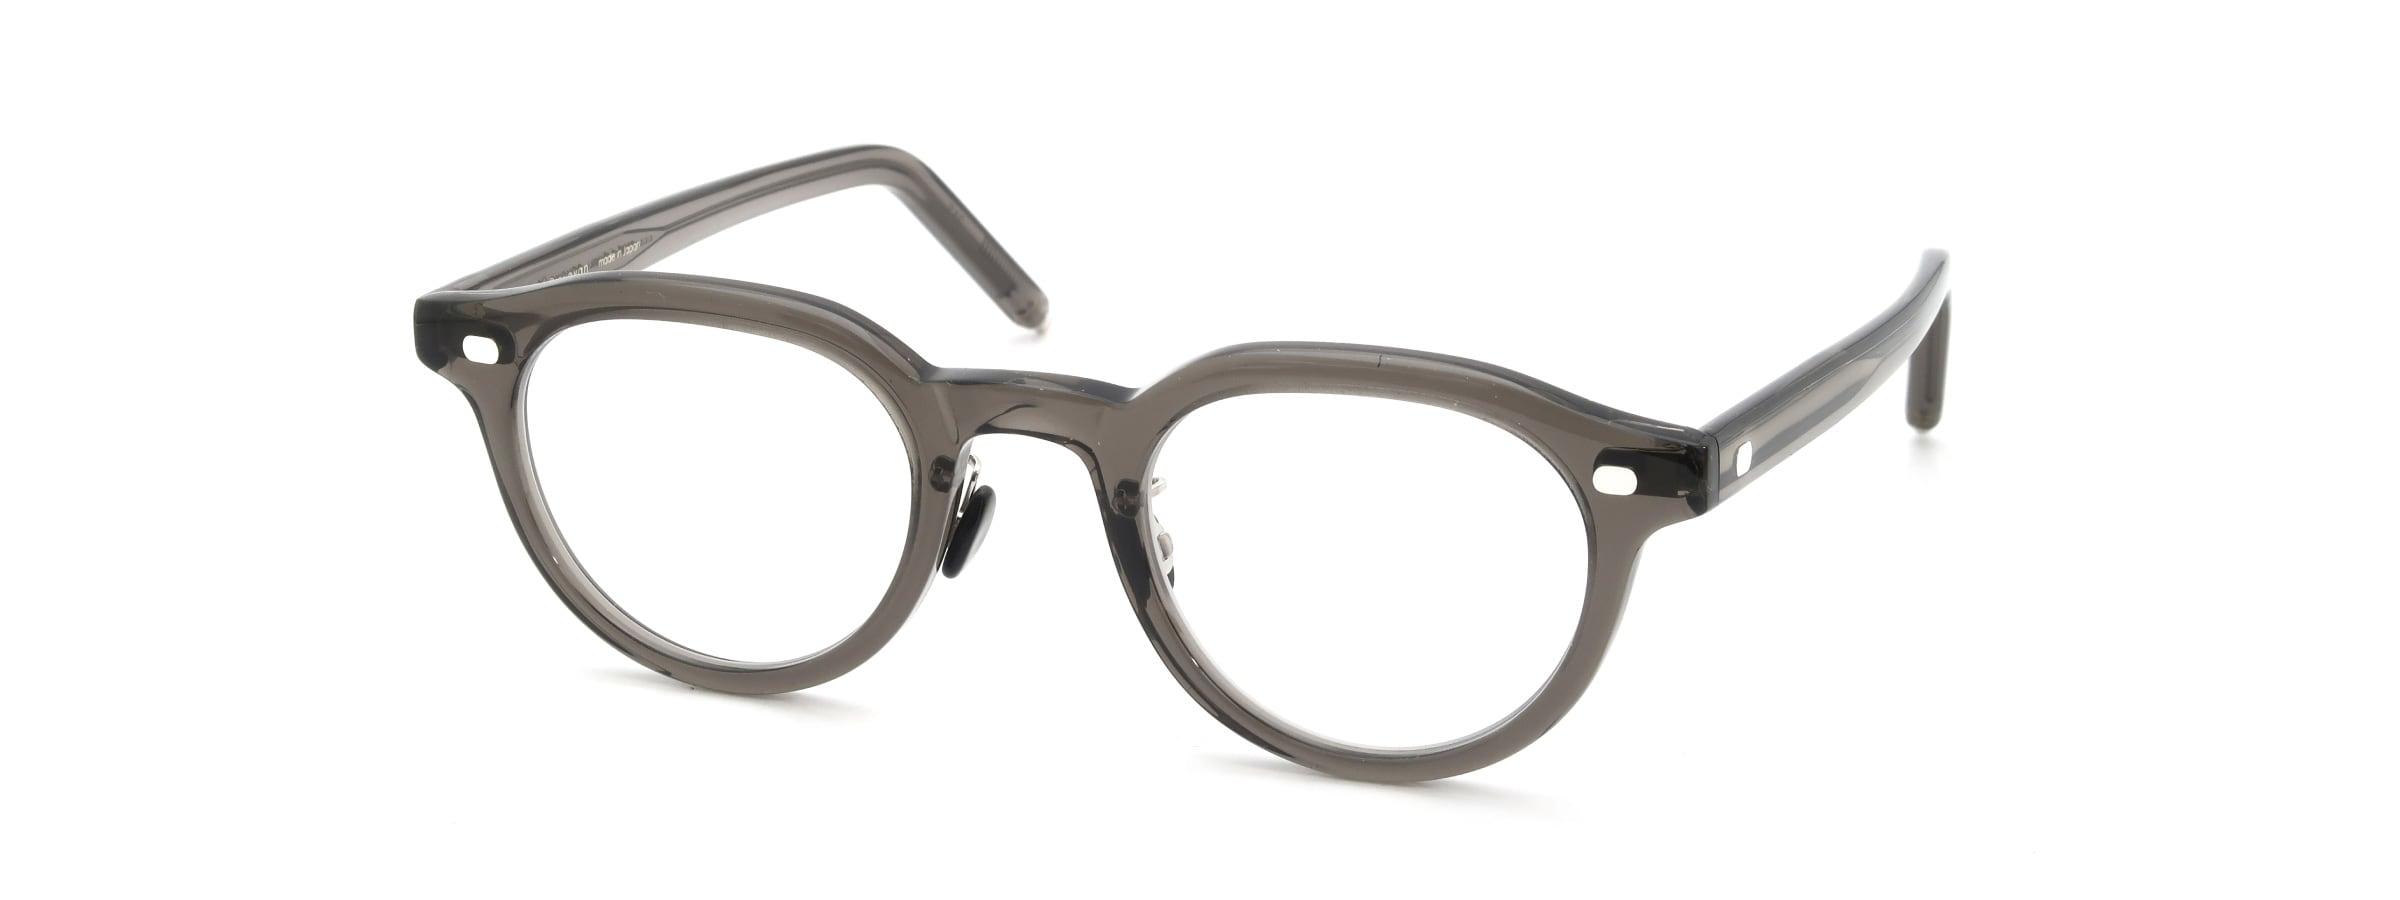 10 eyevan NO.6 Ⅲ FR 46size c.1011S Grey全体像